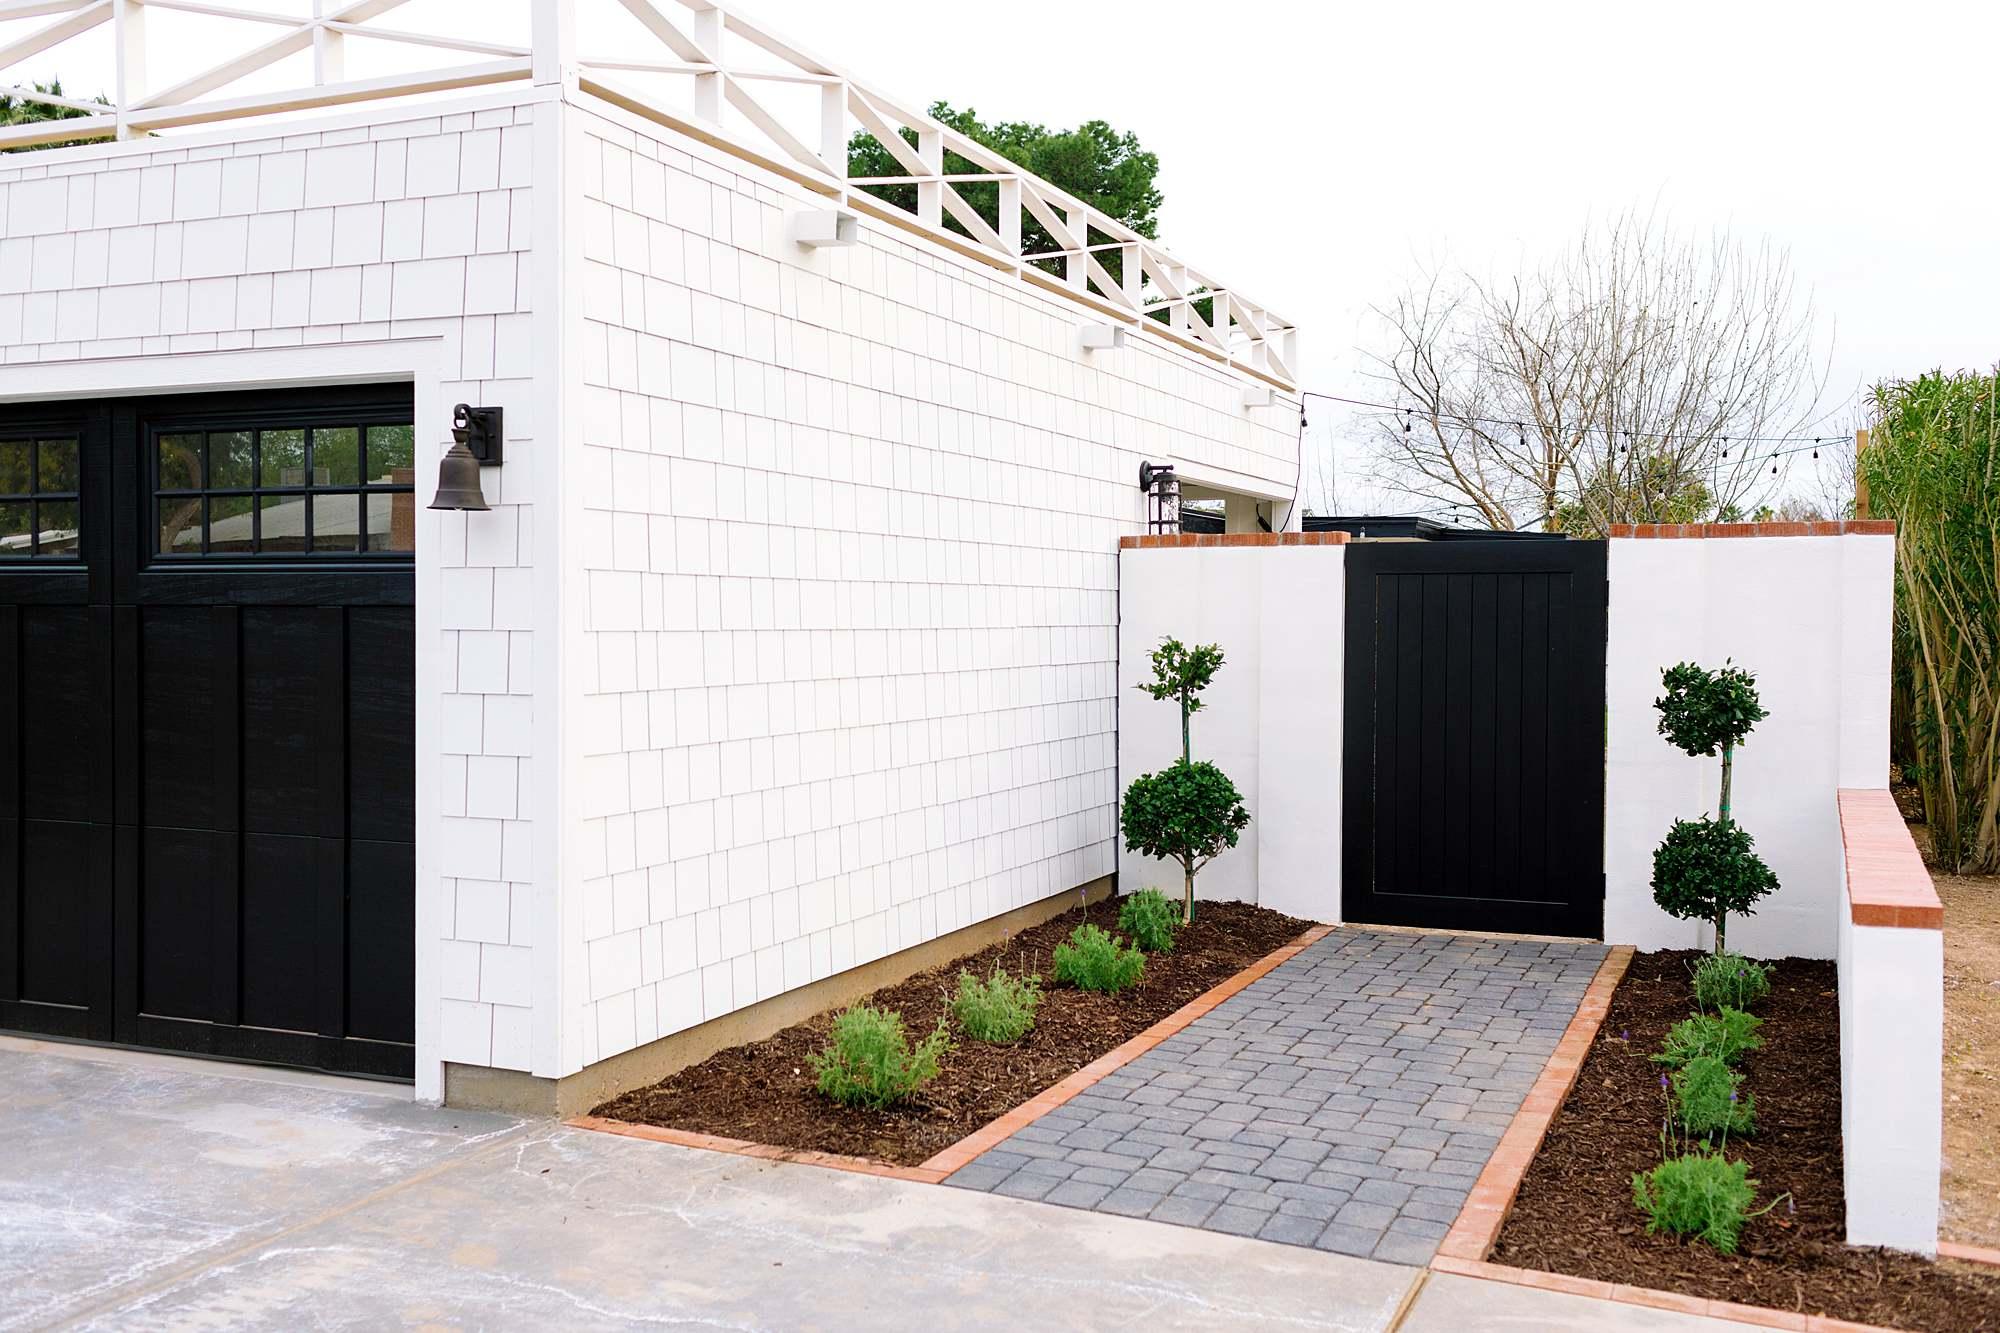 front yard gate side of flat roof garage fiber cement shake traditional black and white home garage - arizona phoenix blogger home blog Diana Elizabeth